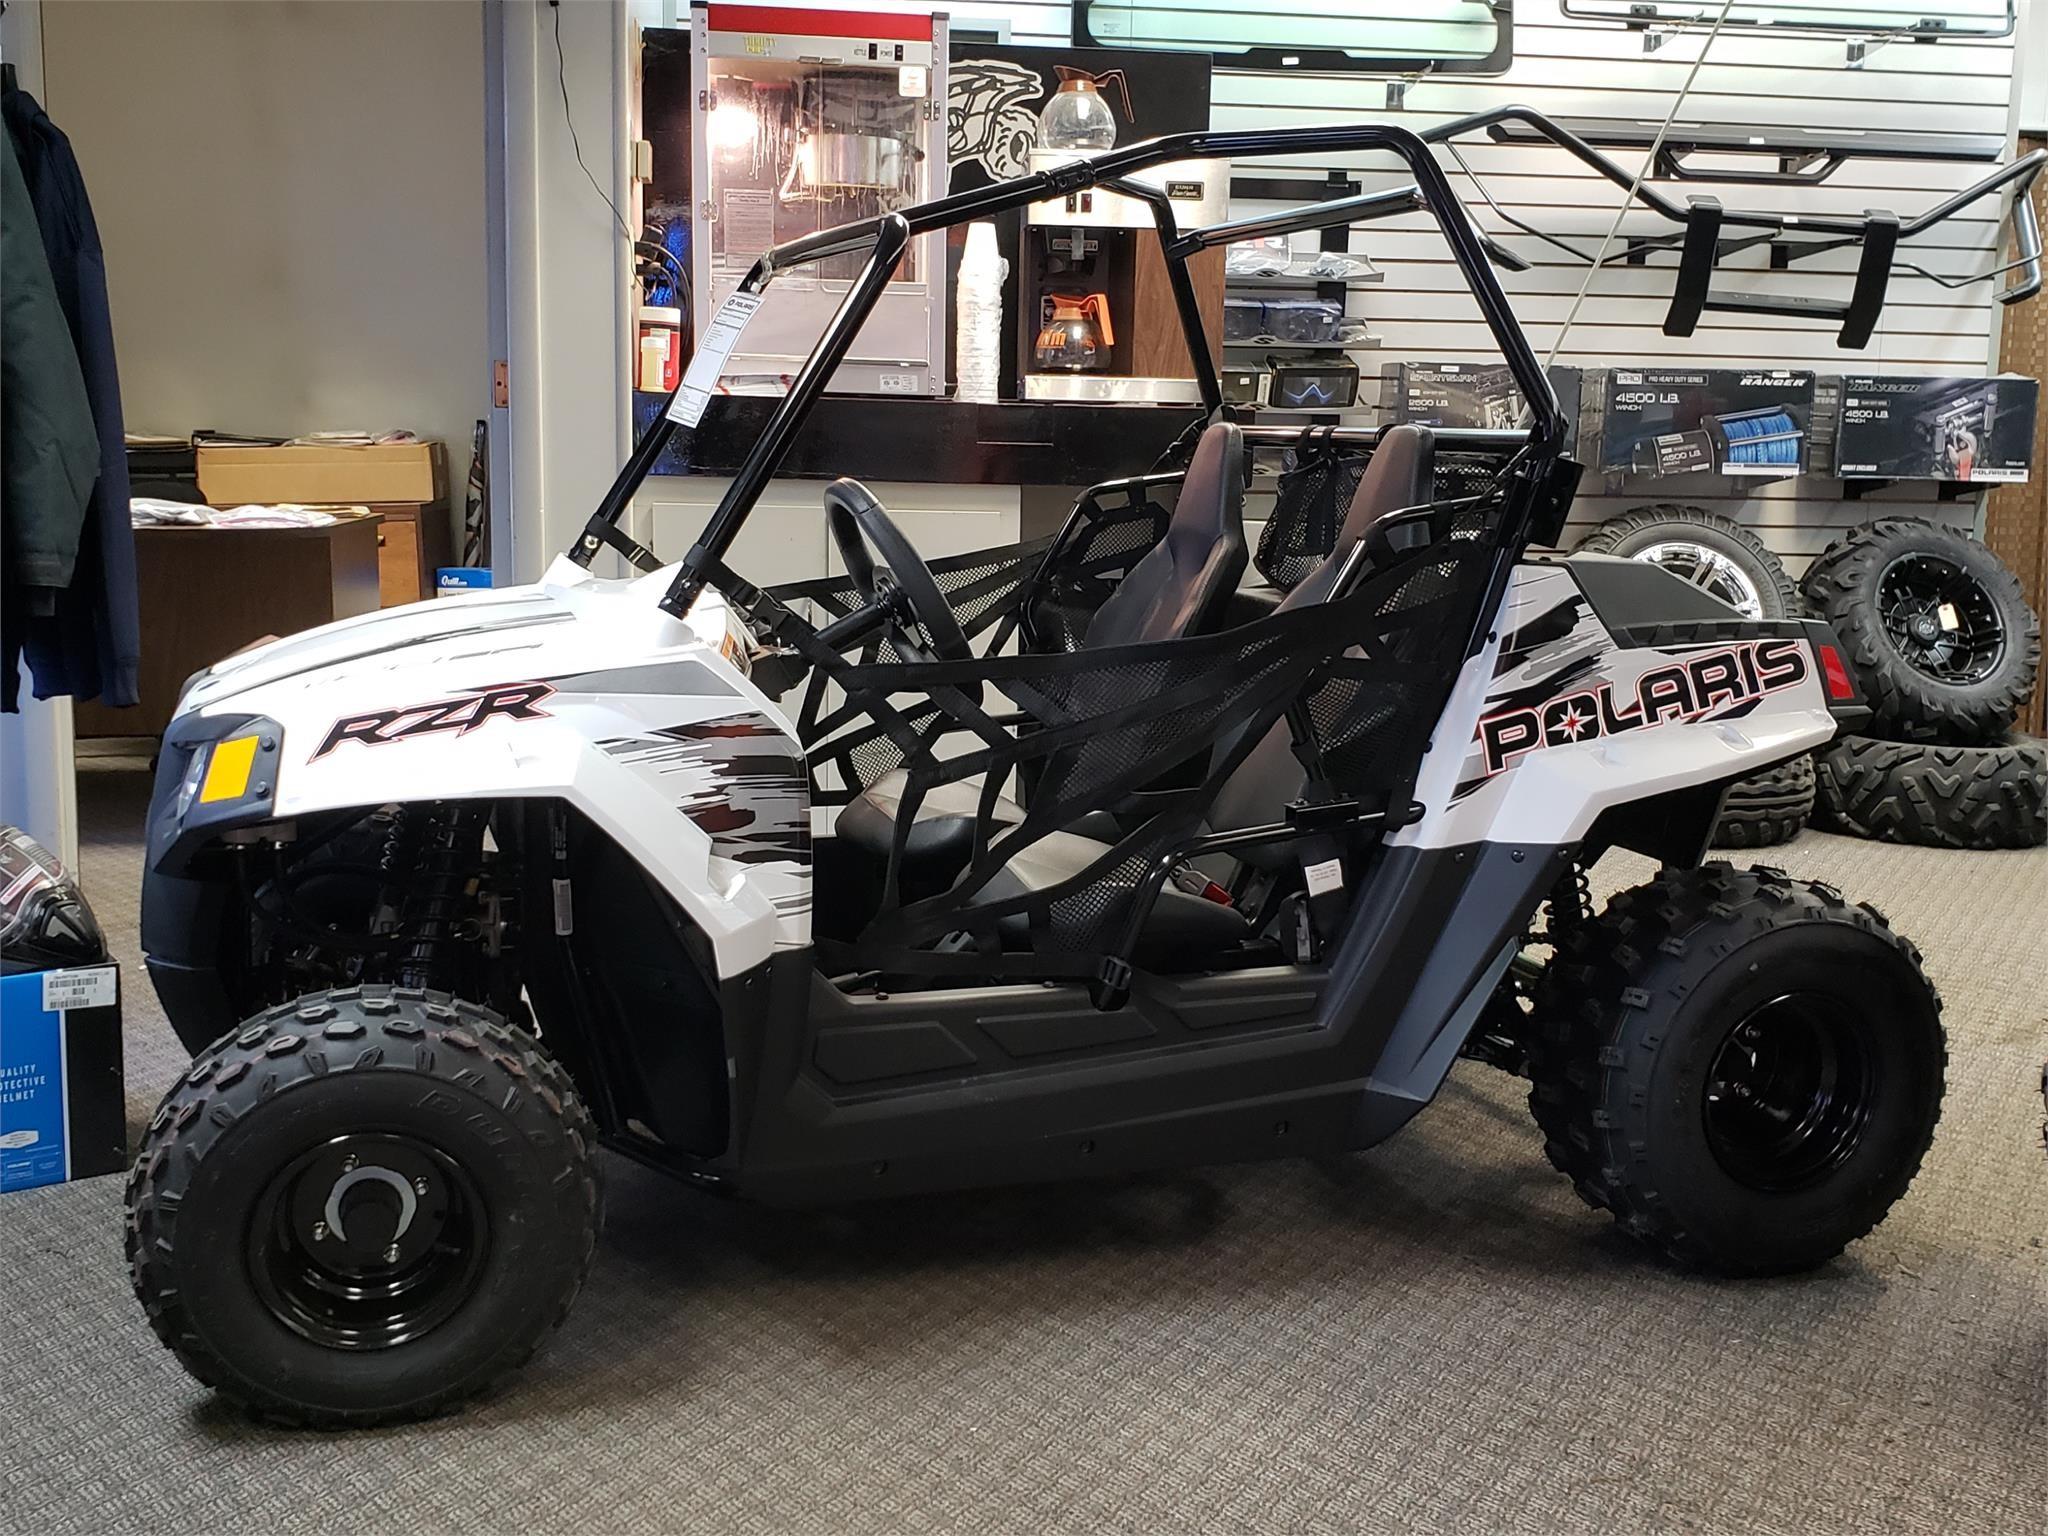 Polaris Razor 170 >> 2019 Polaris Rzr 170 Efi For Sale In Cobb Wisconsin